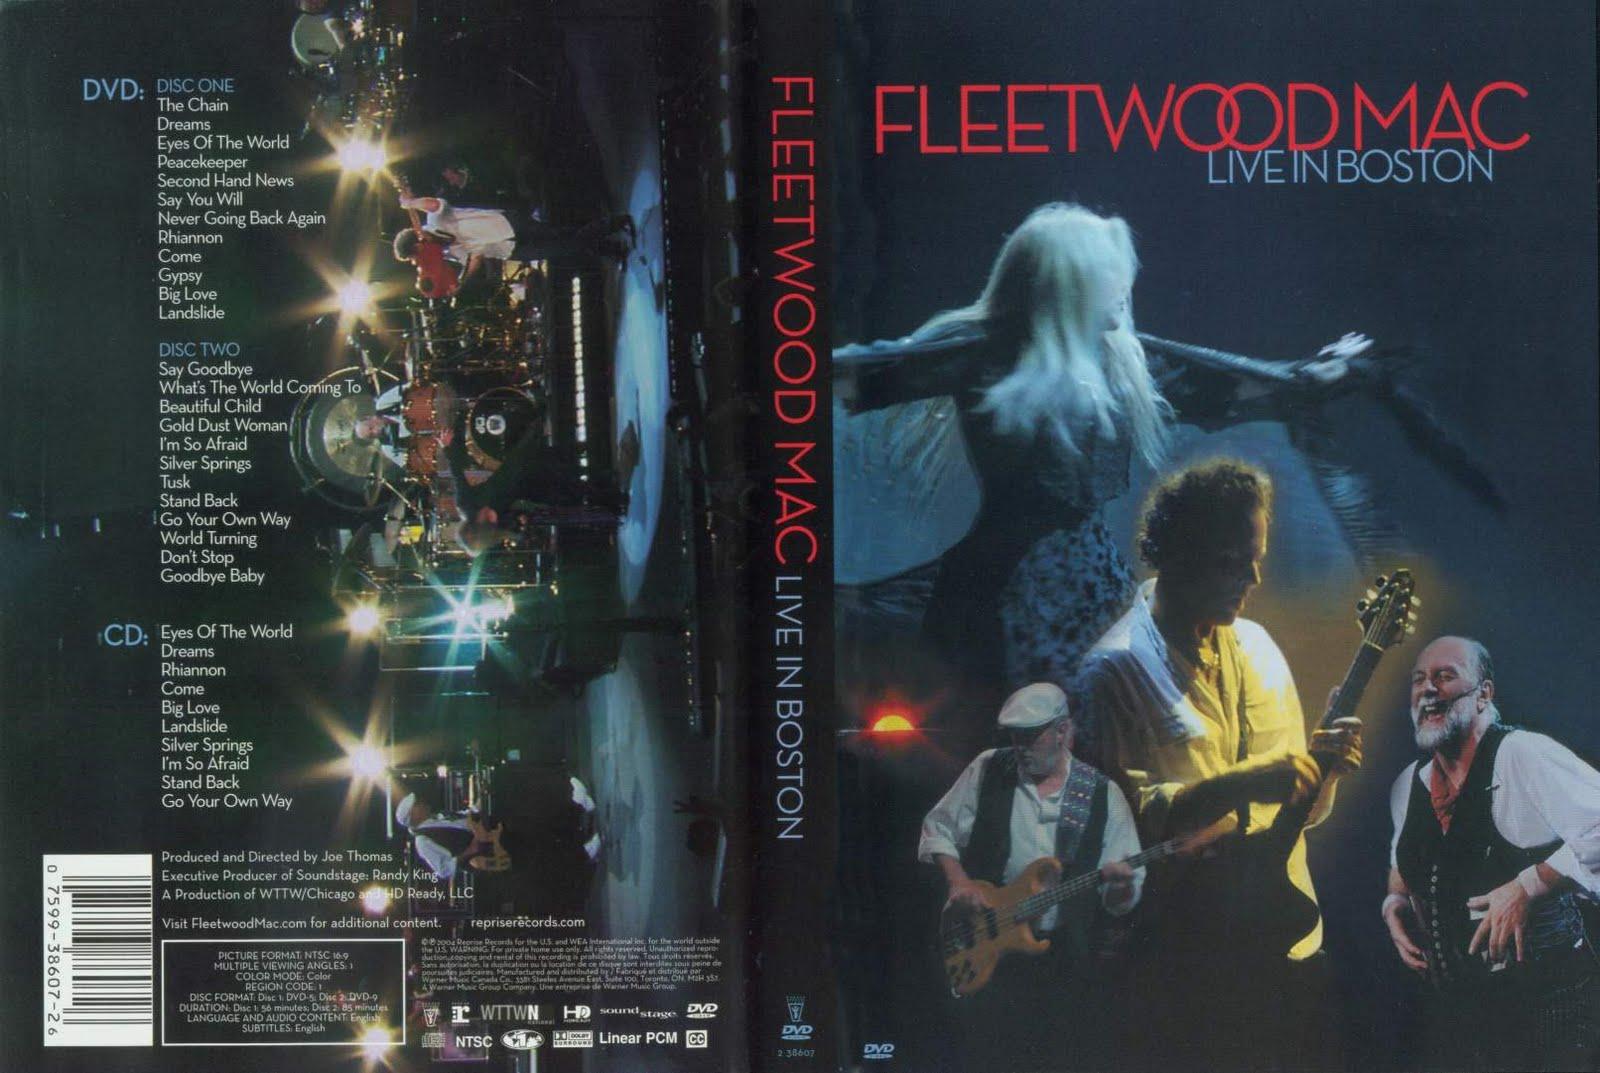 http://3.bp.blogspot.com/_se0zHB8H7oU/S_McVLK1WdI/AAAAAAAACgQ/OCVvk-IjYdo/s1600/Fleetwood+Mac+-+Live+In+Boston+-+Cover.jpg